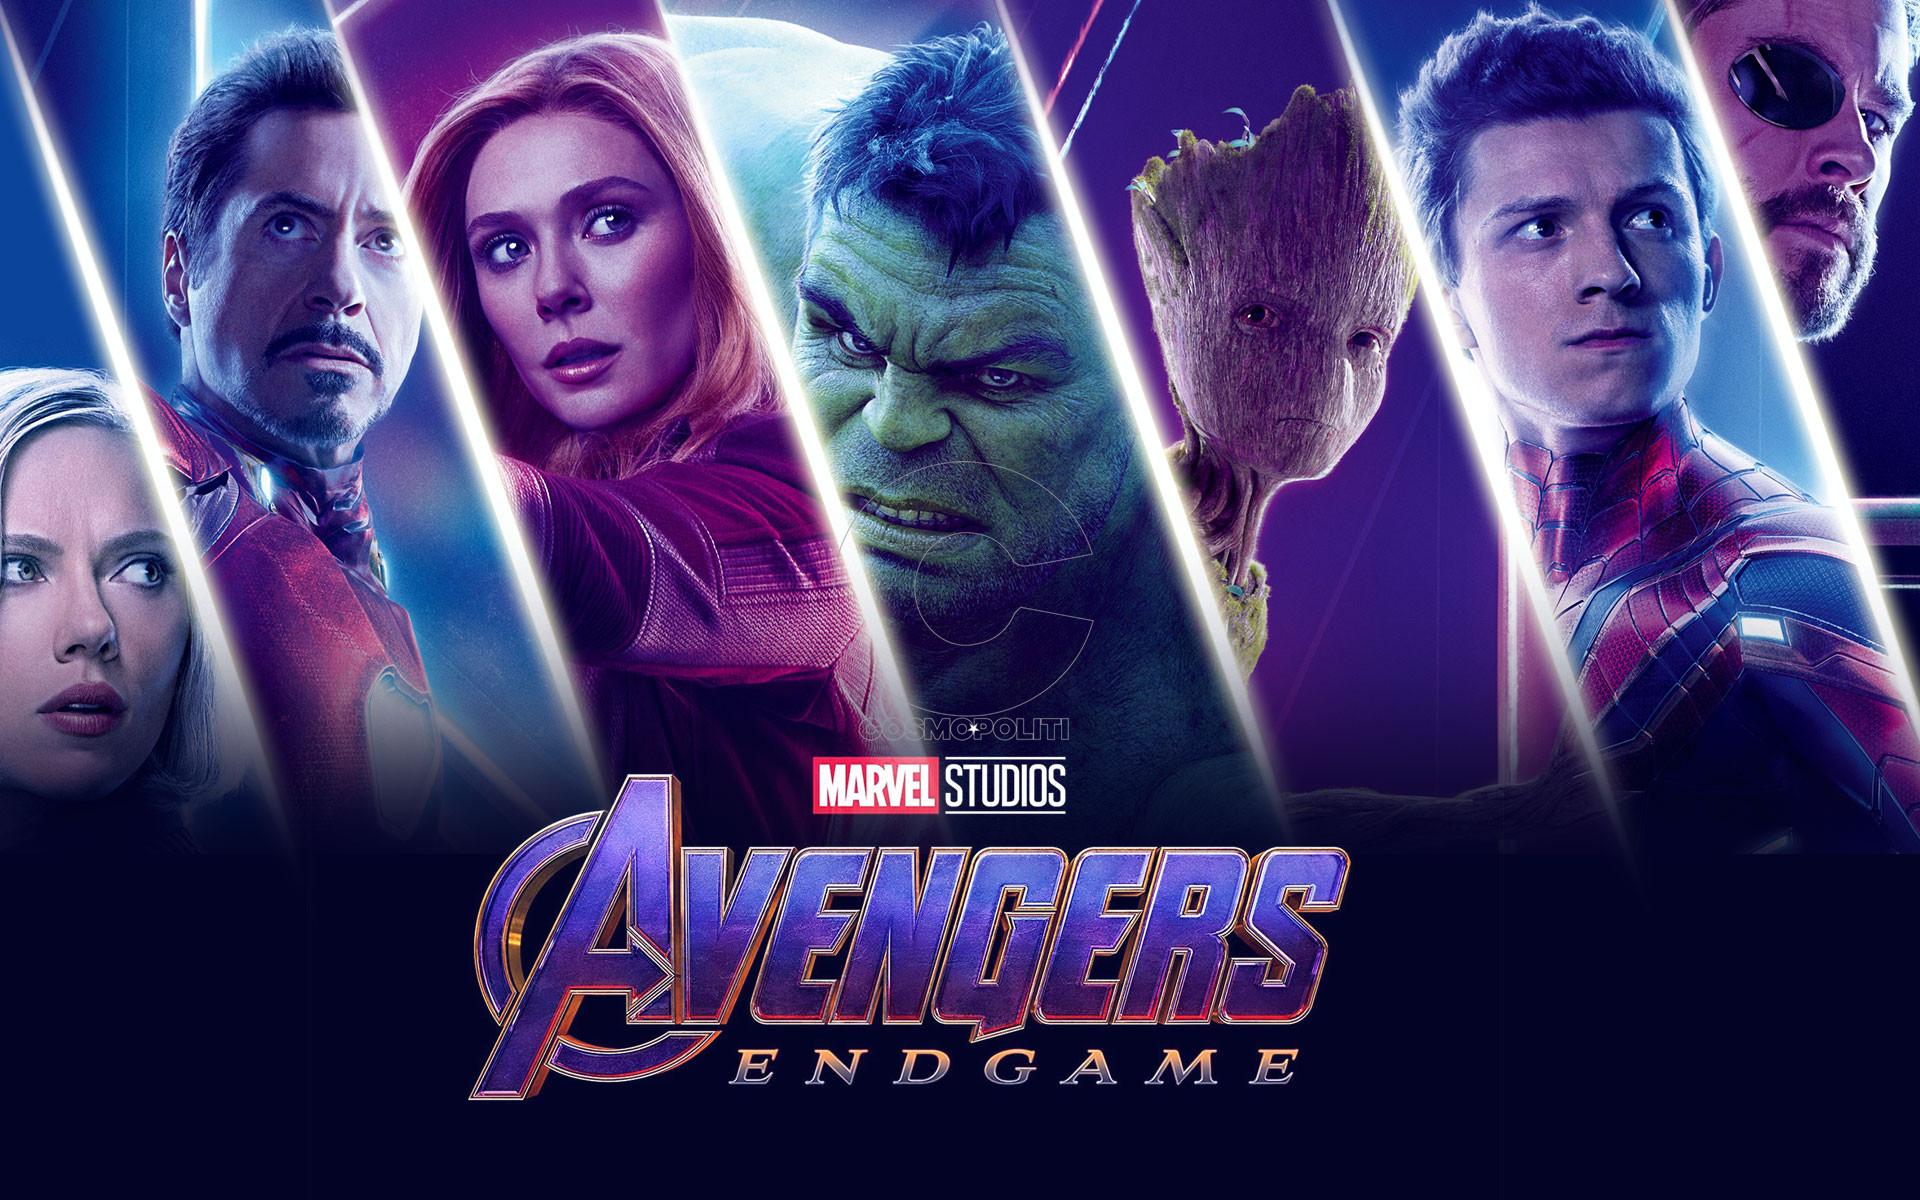 Avengers-Endgame-2019-Desktop-Movie-Wallpapers-HD-4-1